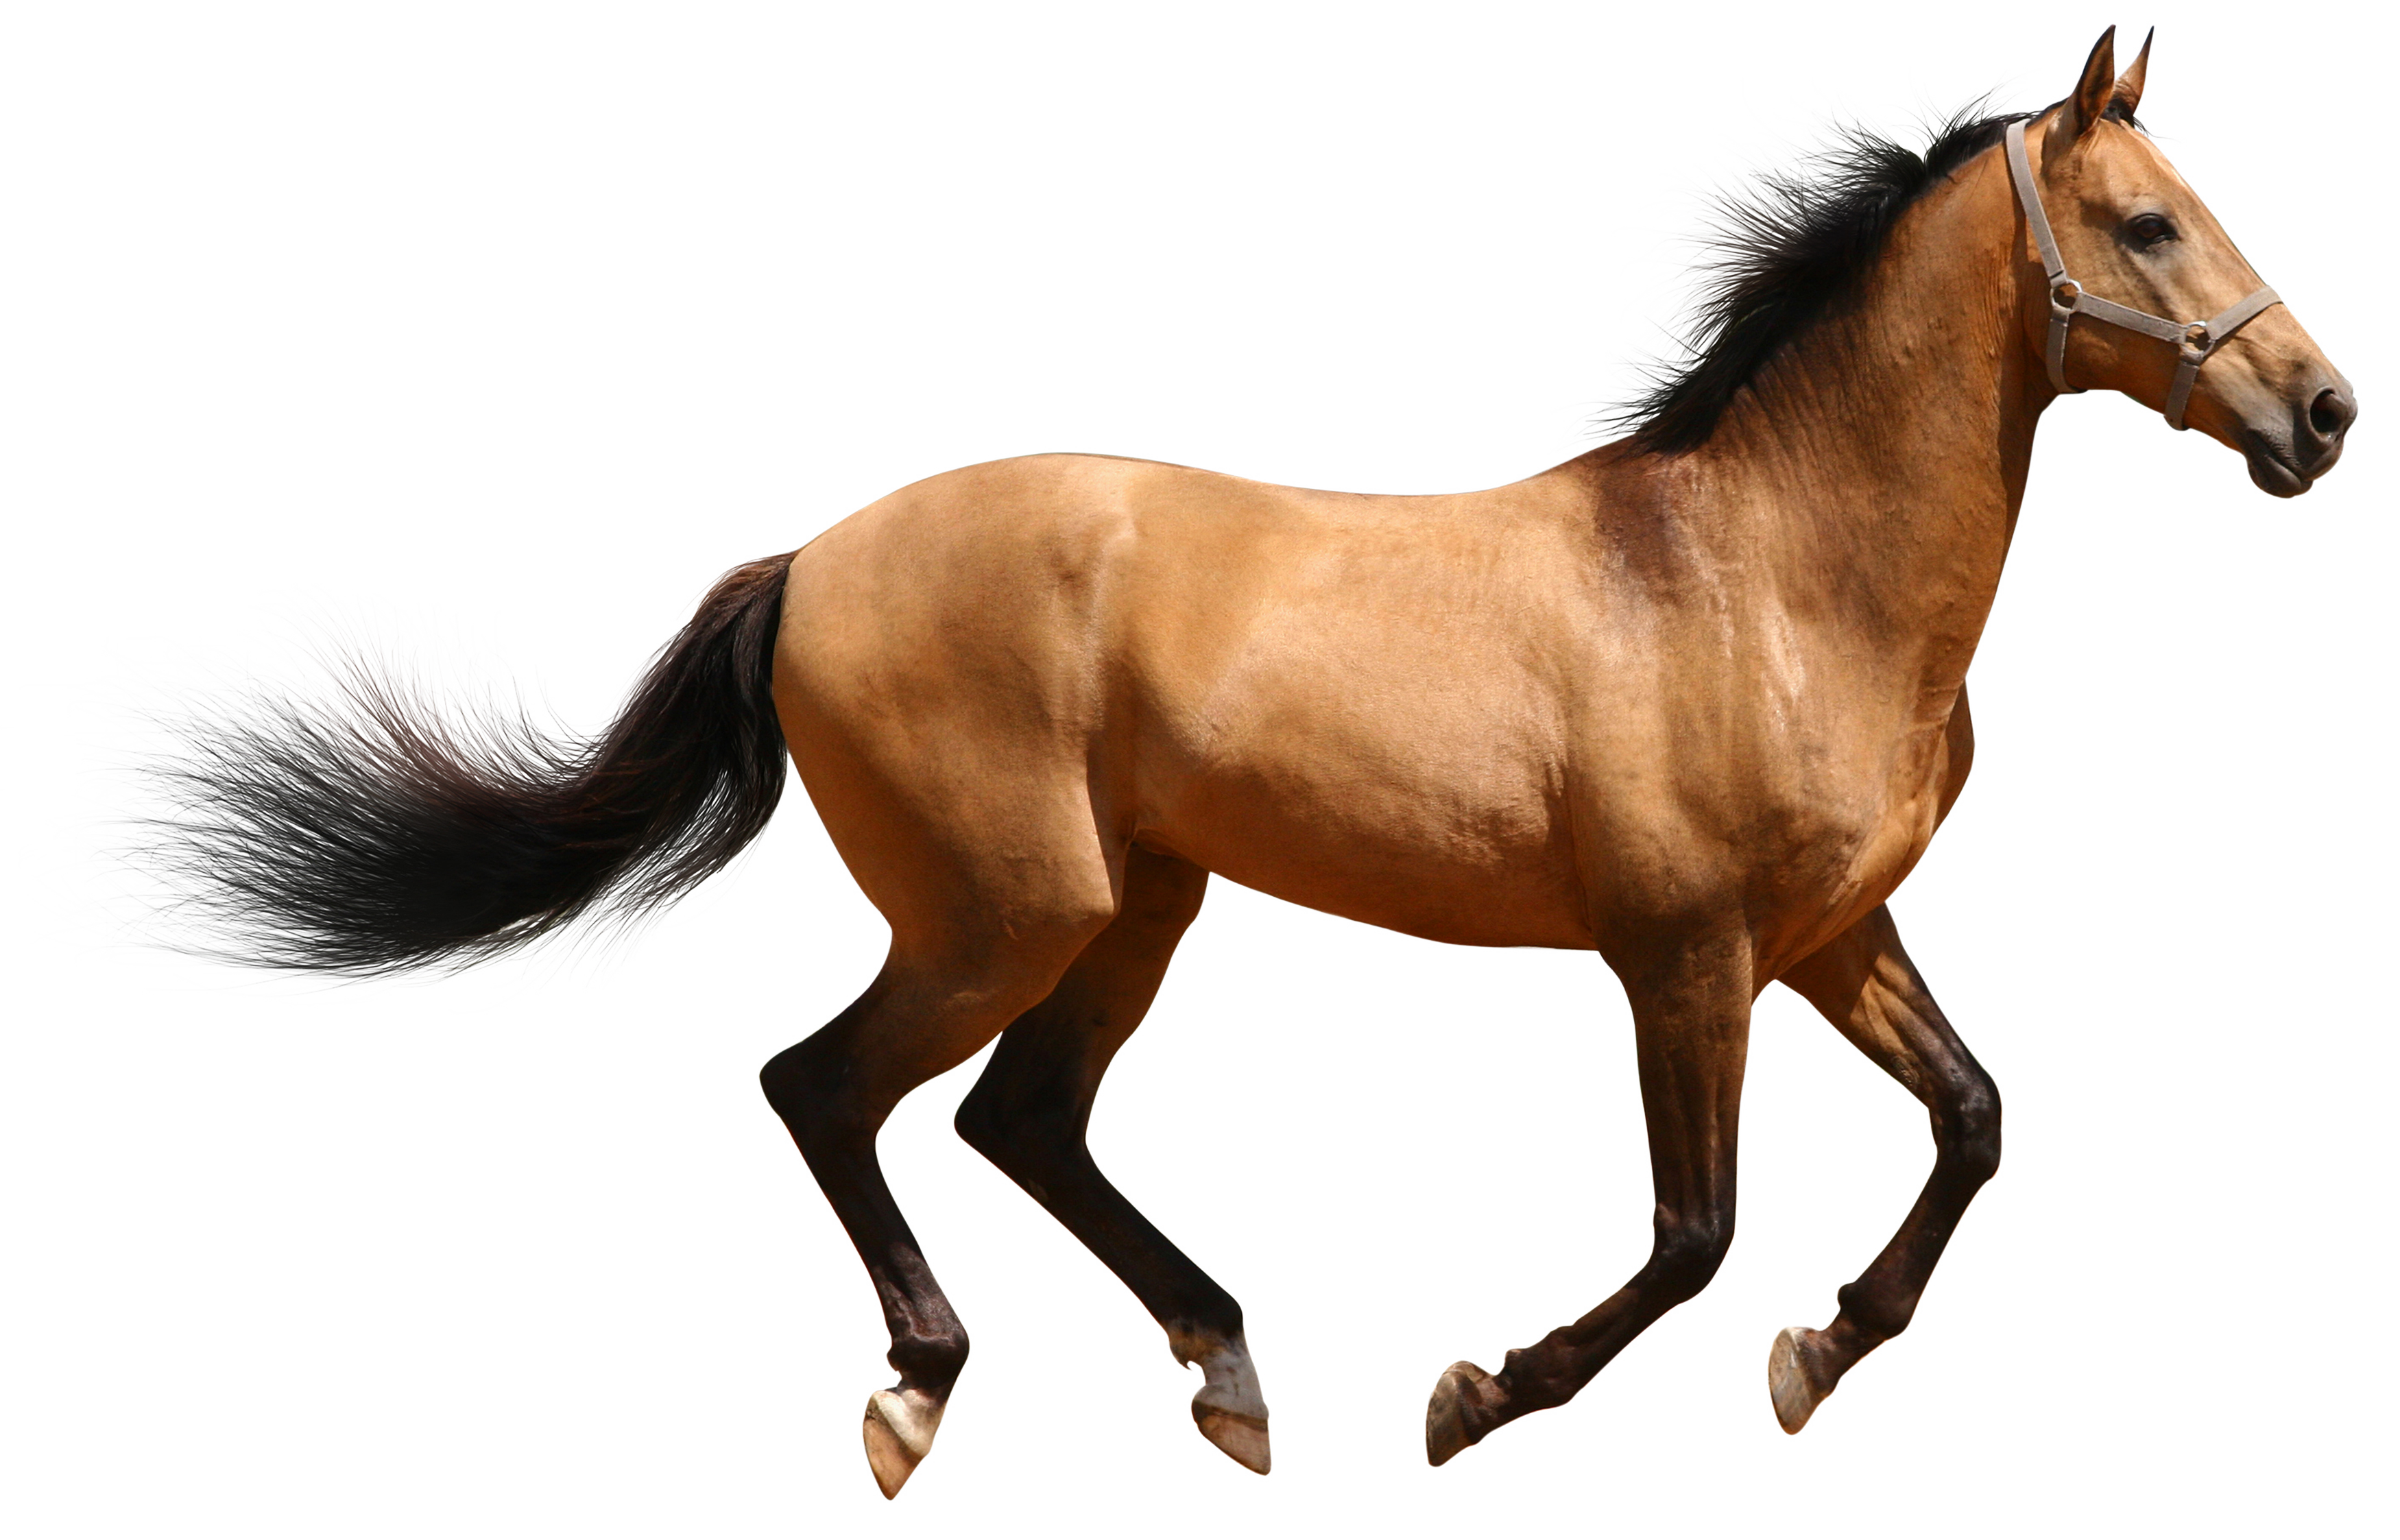 Donkey clipart tiny horse. Facts history useful information